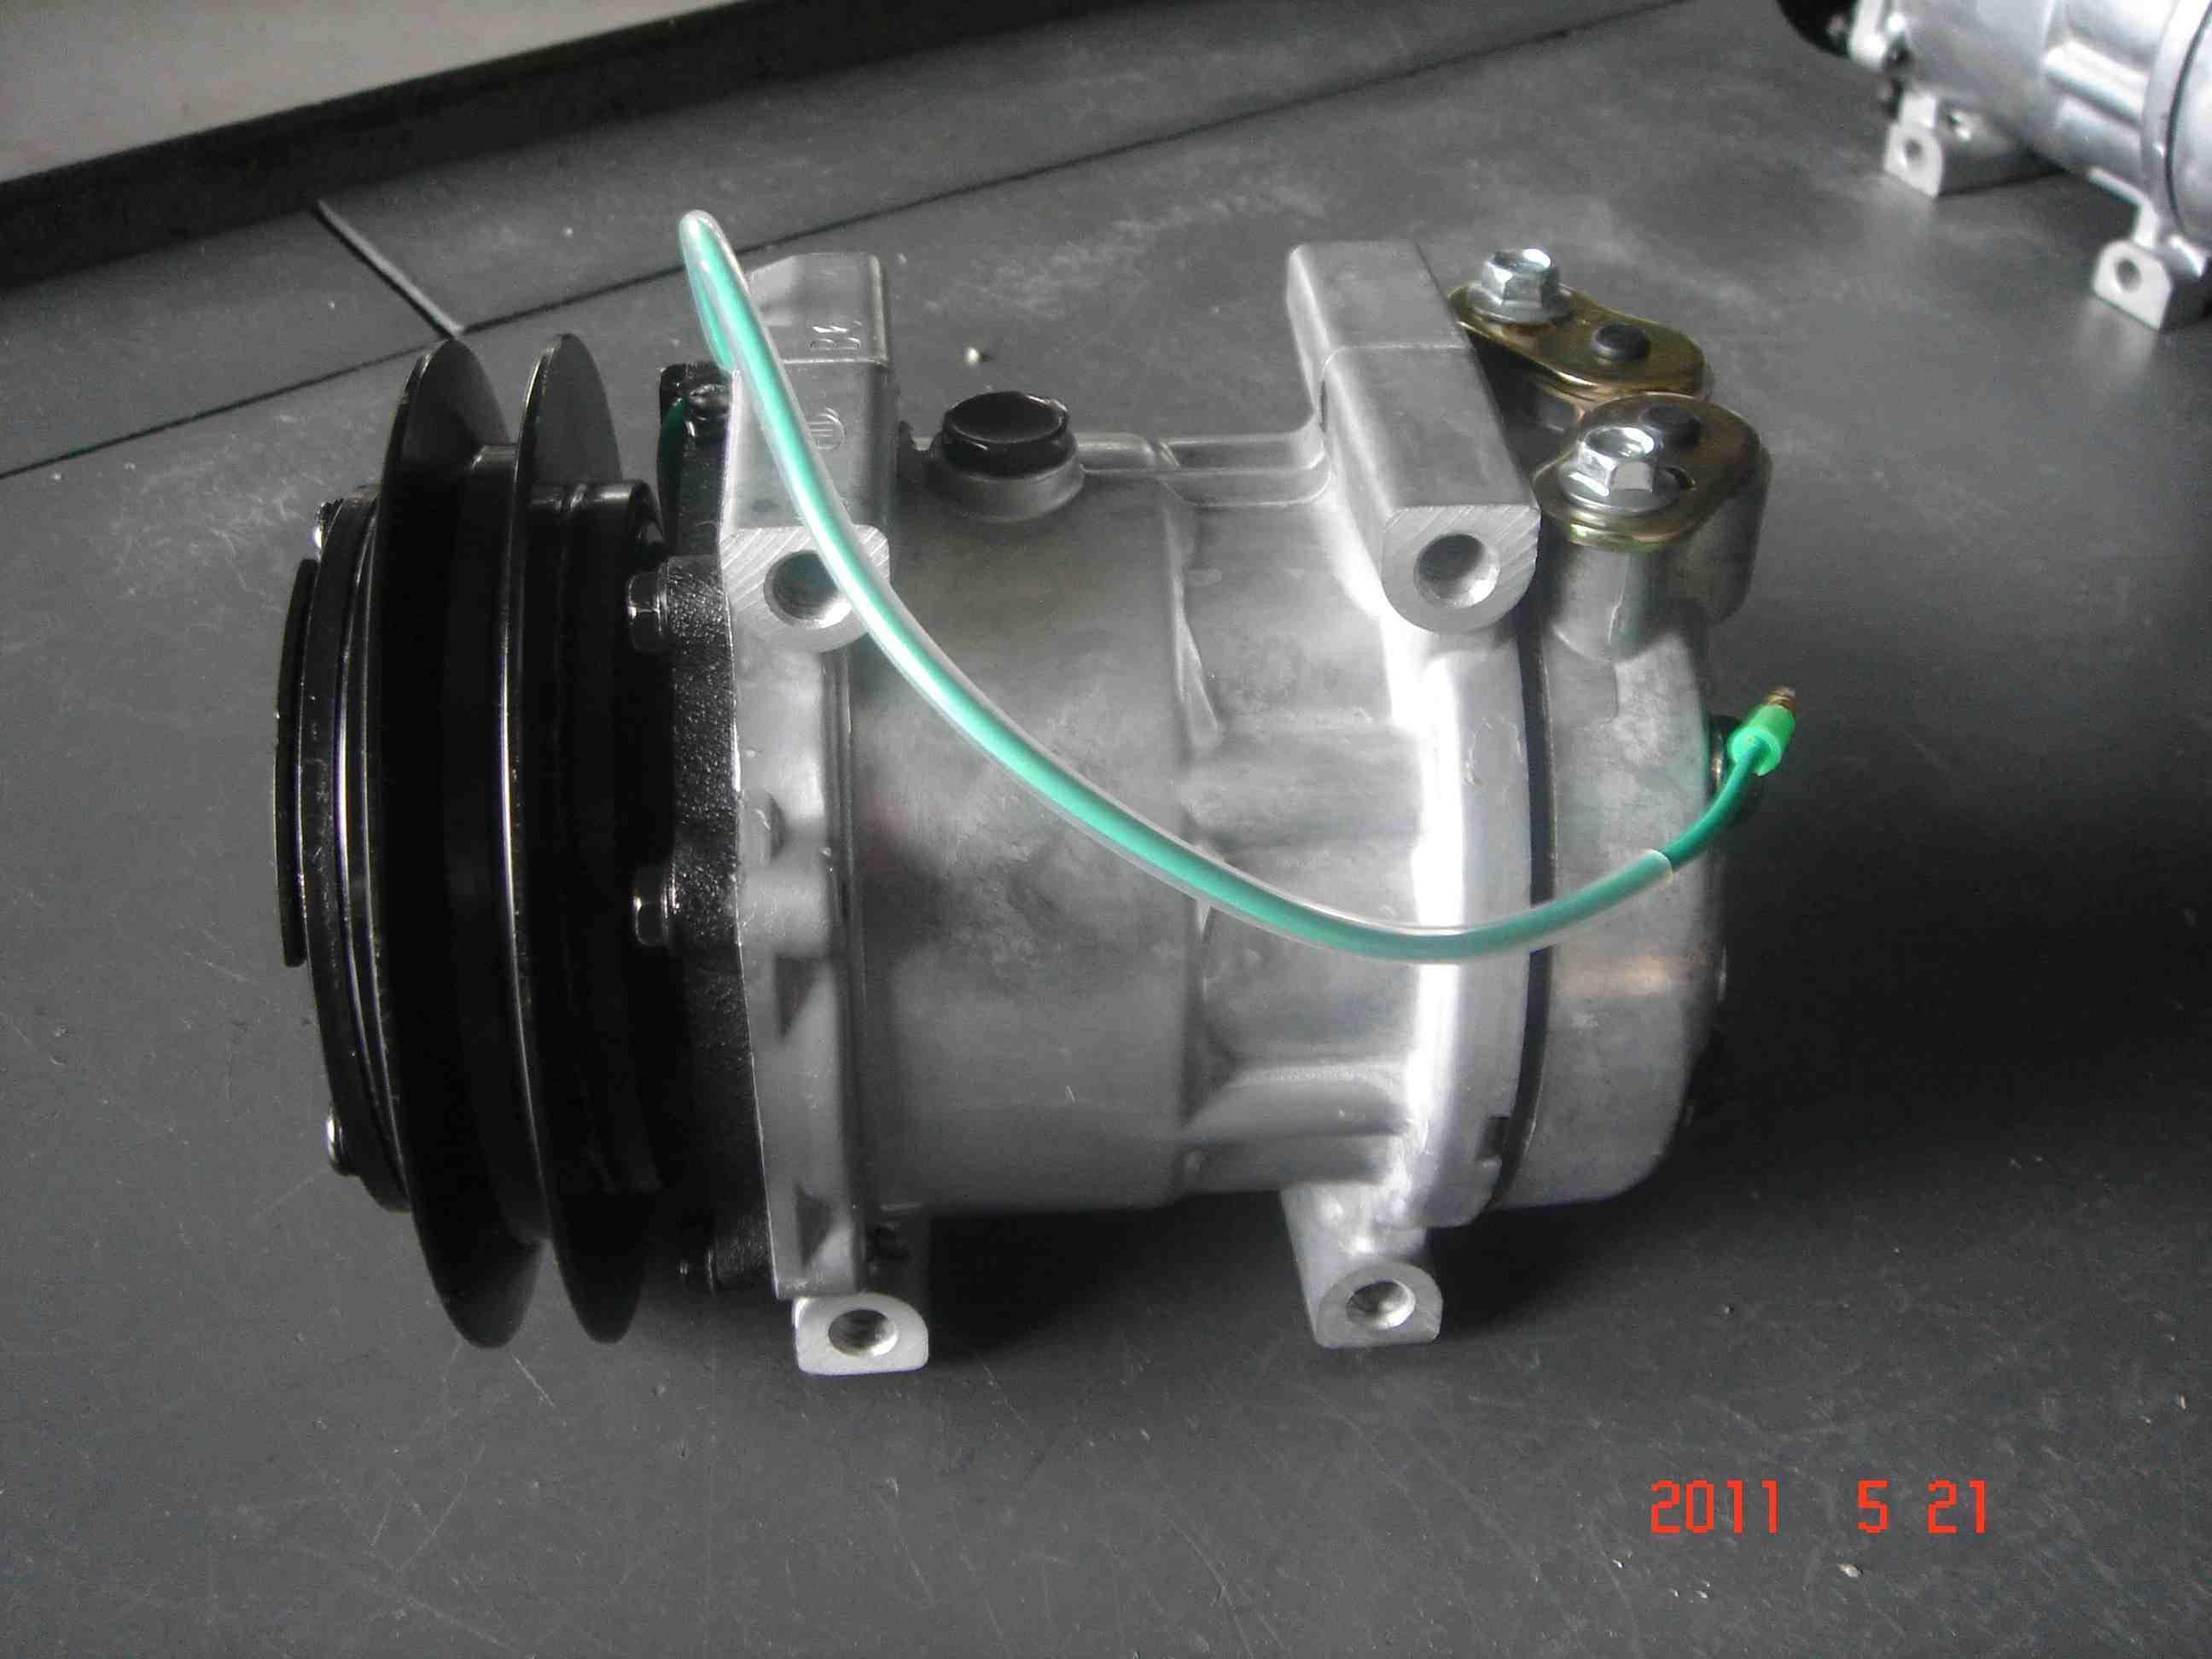 AC Air Compressor for New Holland Lb-90 (7H13)